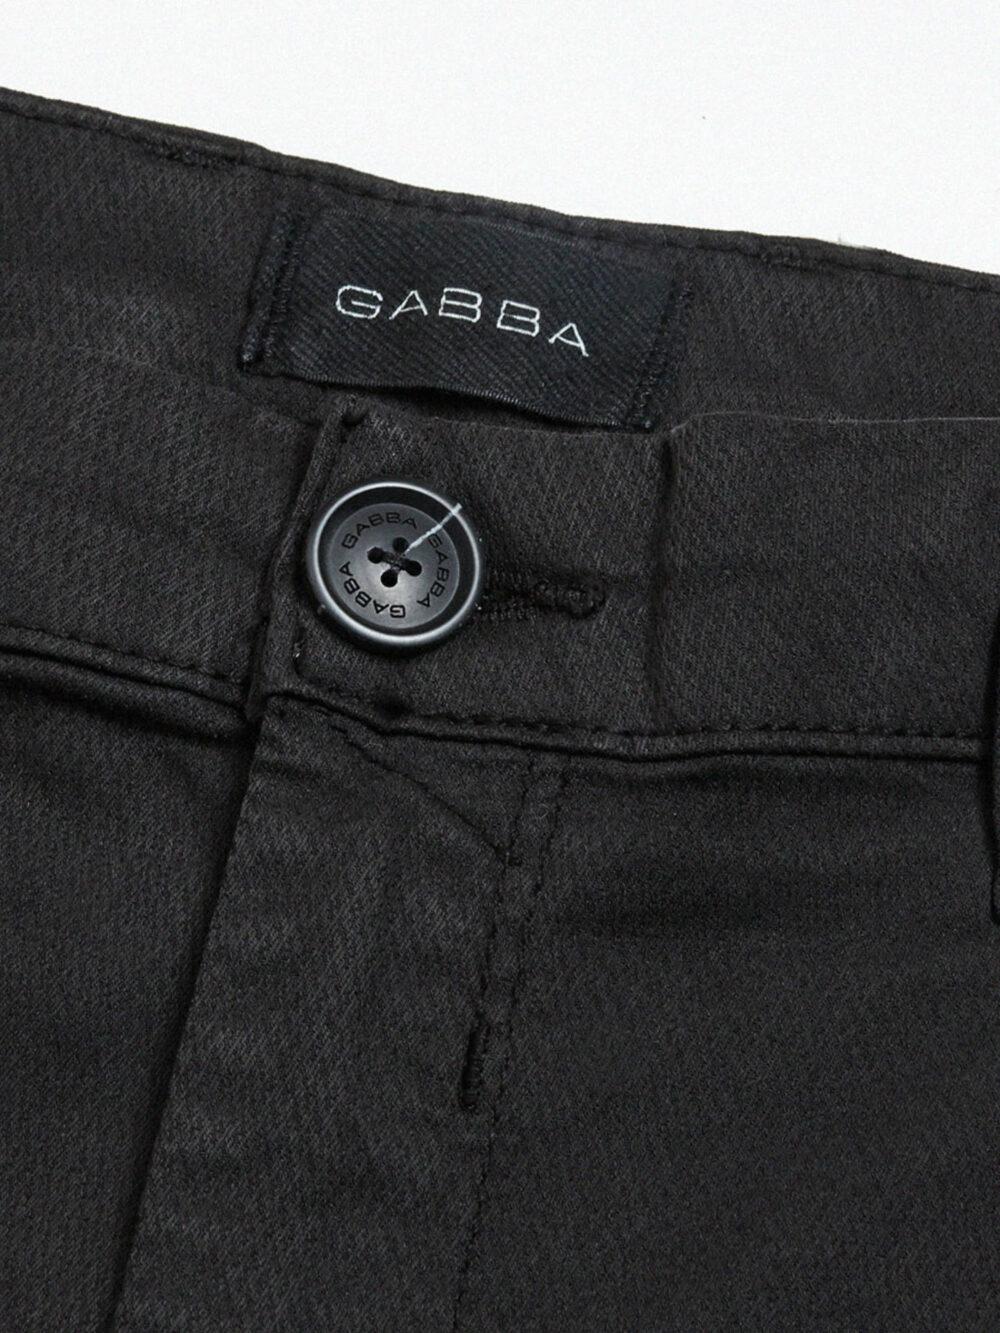 Gabba Paul K3280 Dale Chino Black